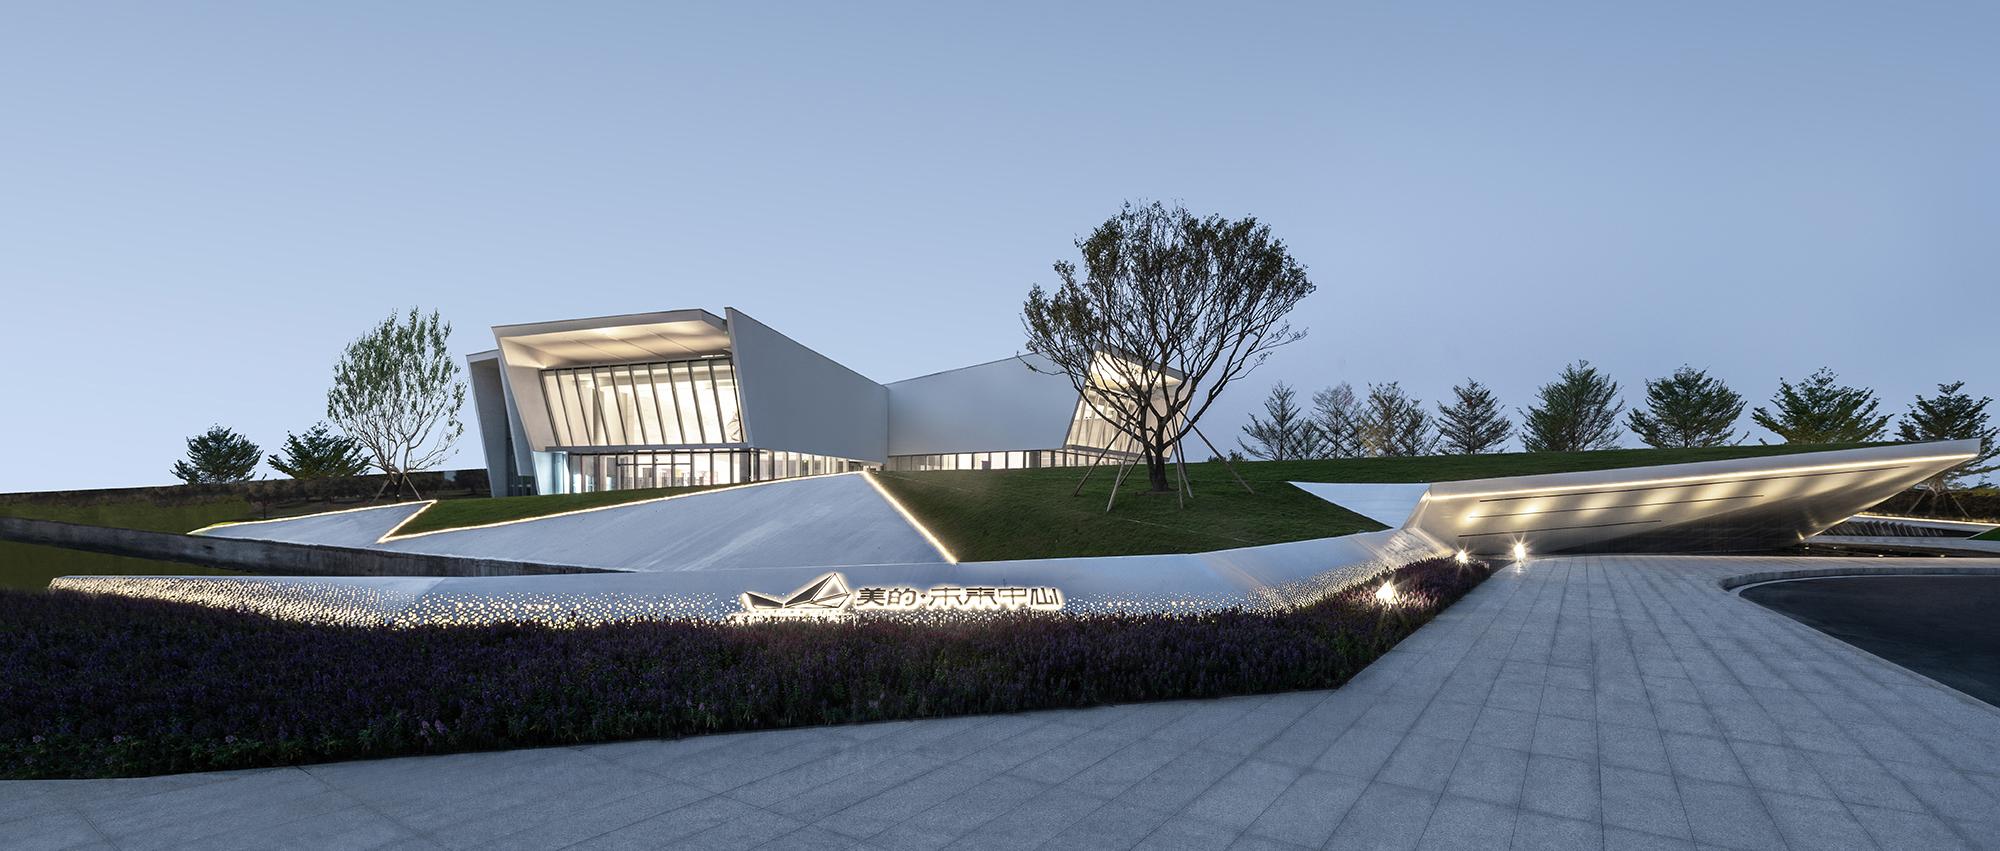 XAA詹涛工作室:美的未来中心